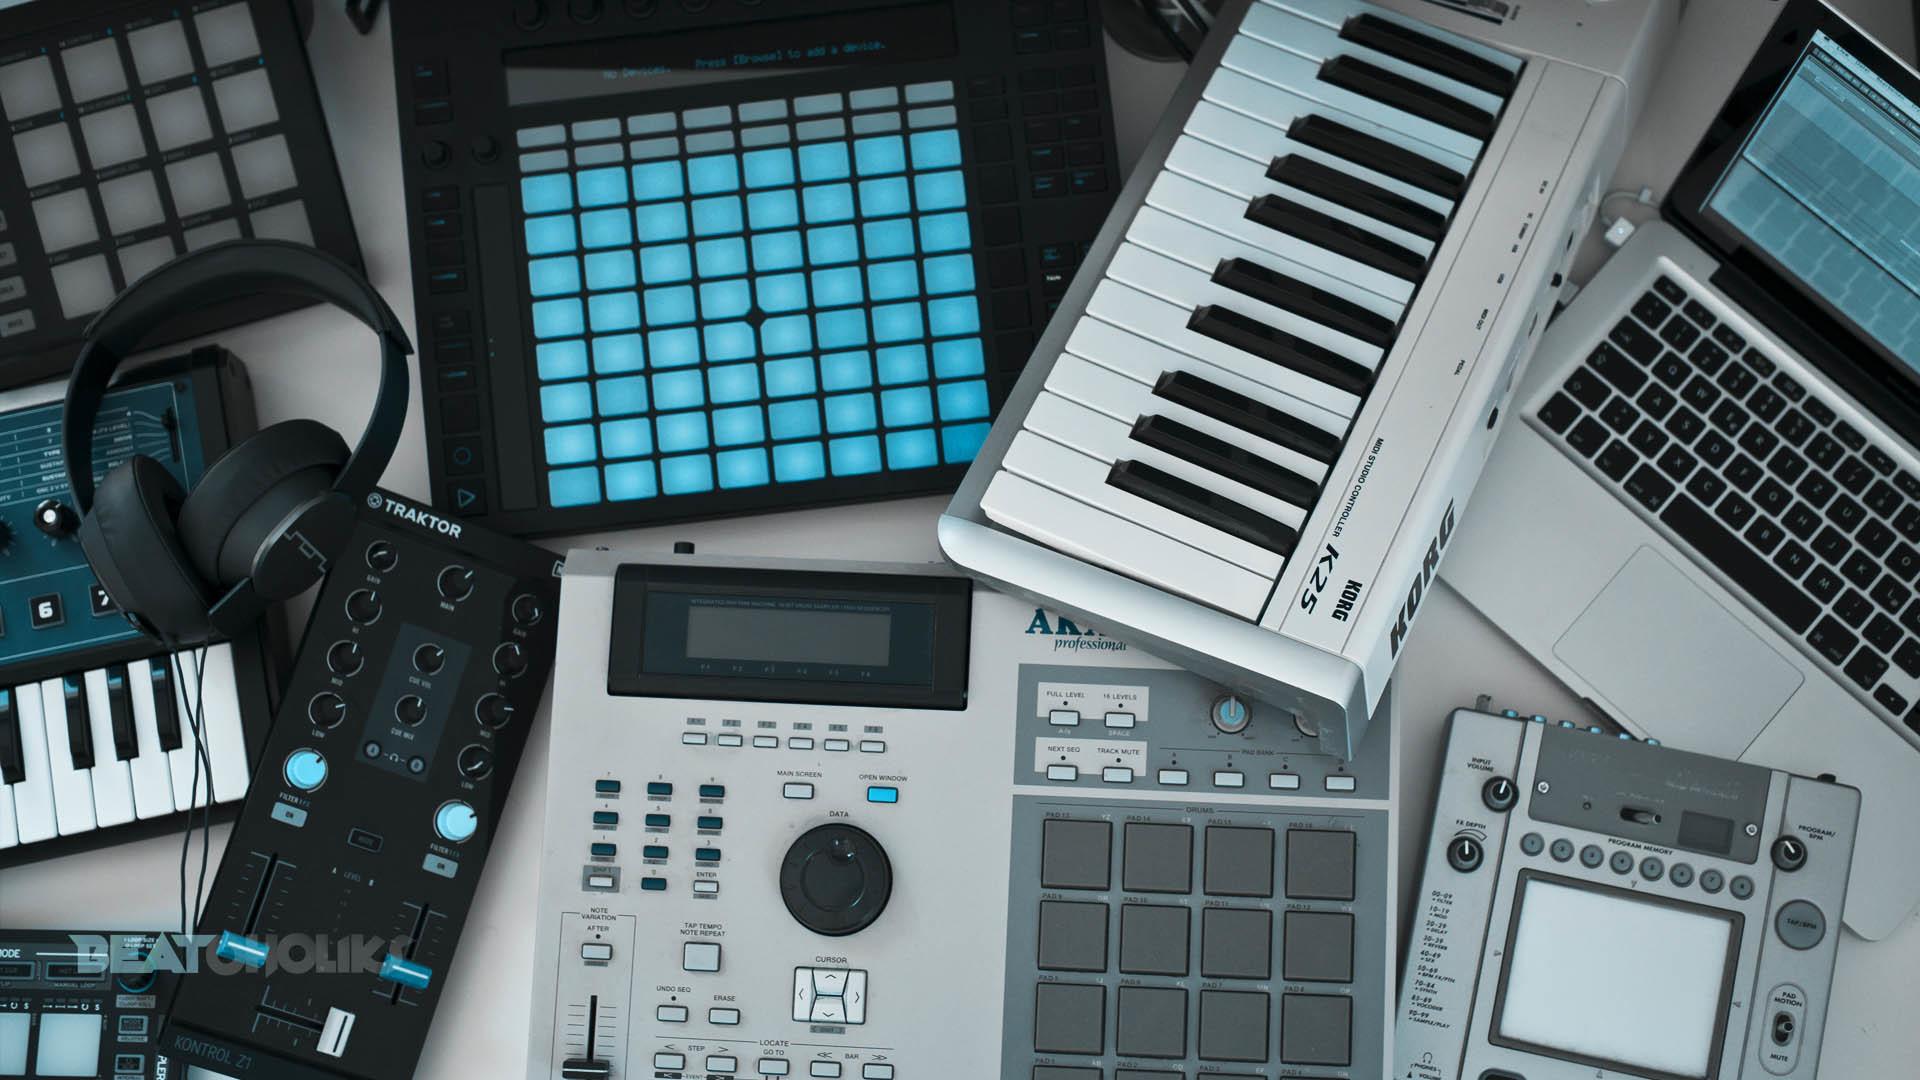 1920x1080, 3 Music Production Tips For Beginners   - Hd Wallpaper Music Studio - HD Wallpaper